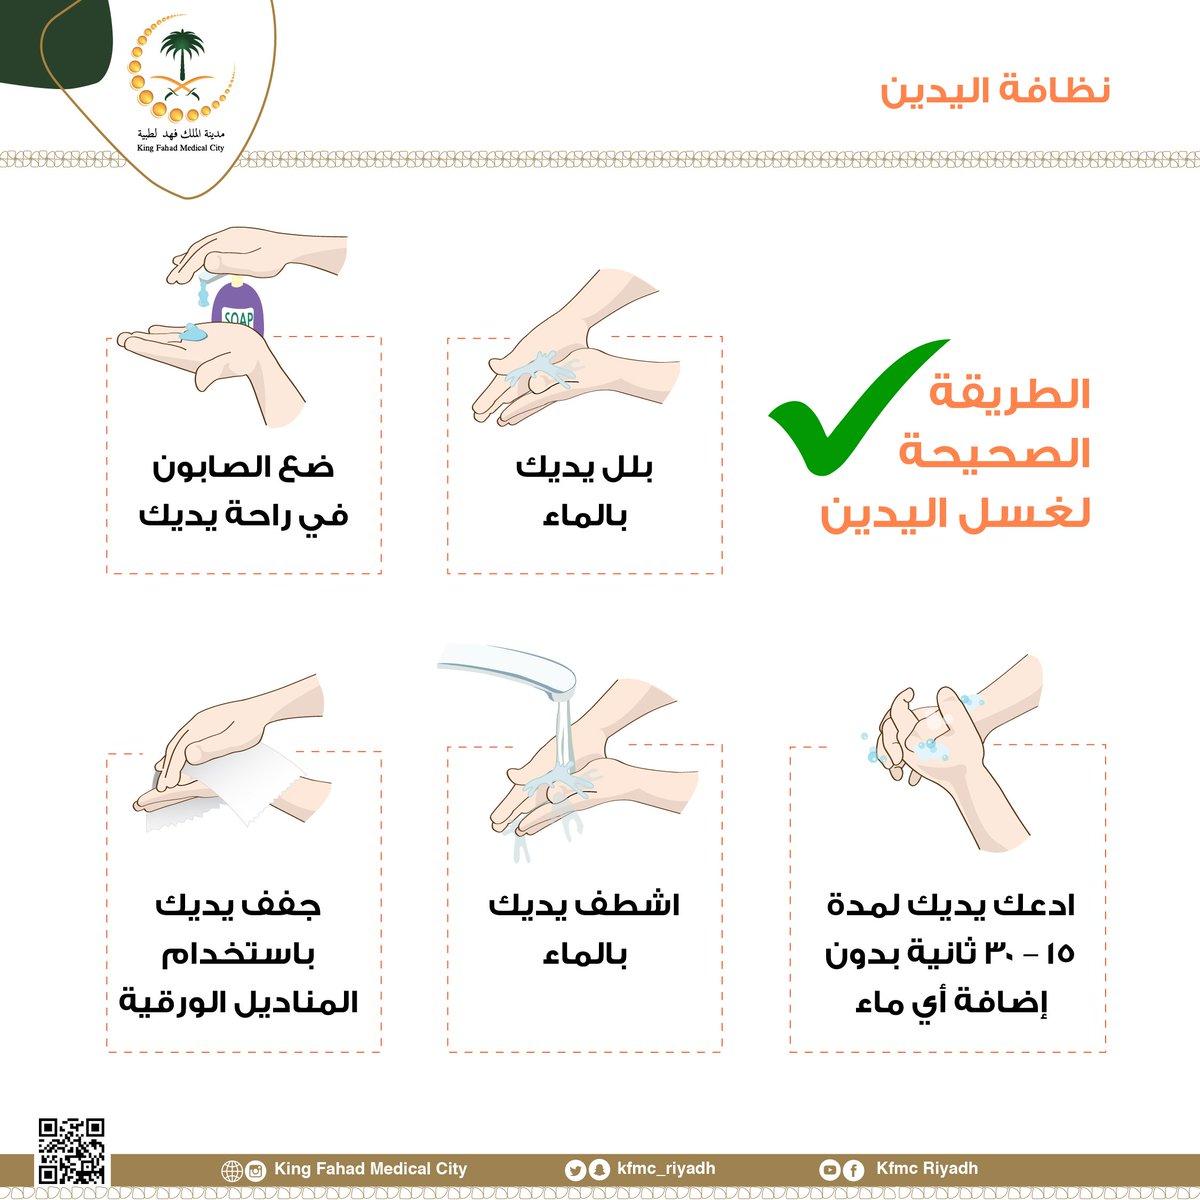 O Xrhsths مدينة الملك فهد الطبية Sto Twitter الطريقة الصحيحة لغسل اليدين اليوم العالمي لنظافة اليدين مدينة الملك فهد الطبية لصحتك